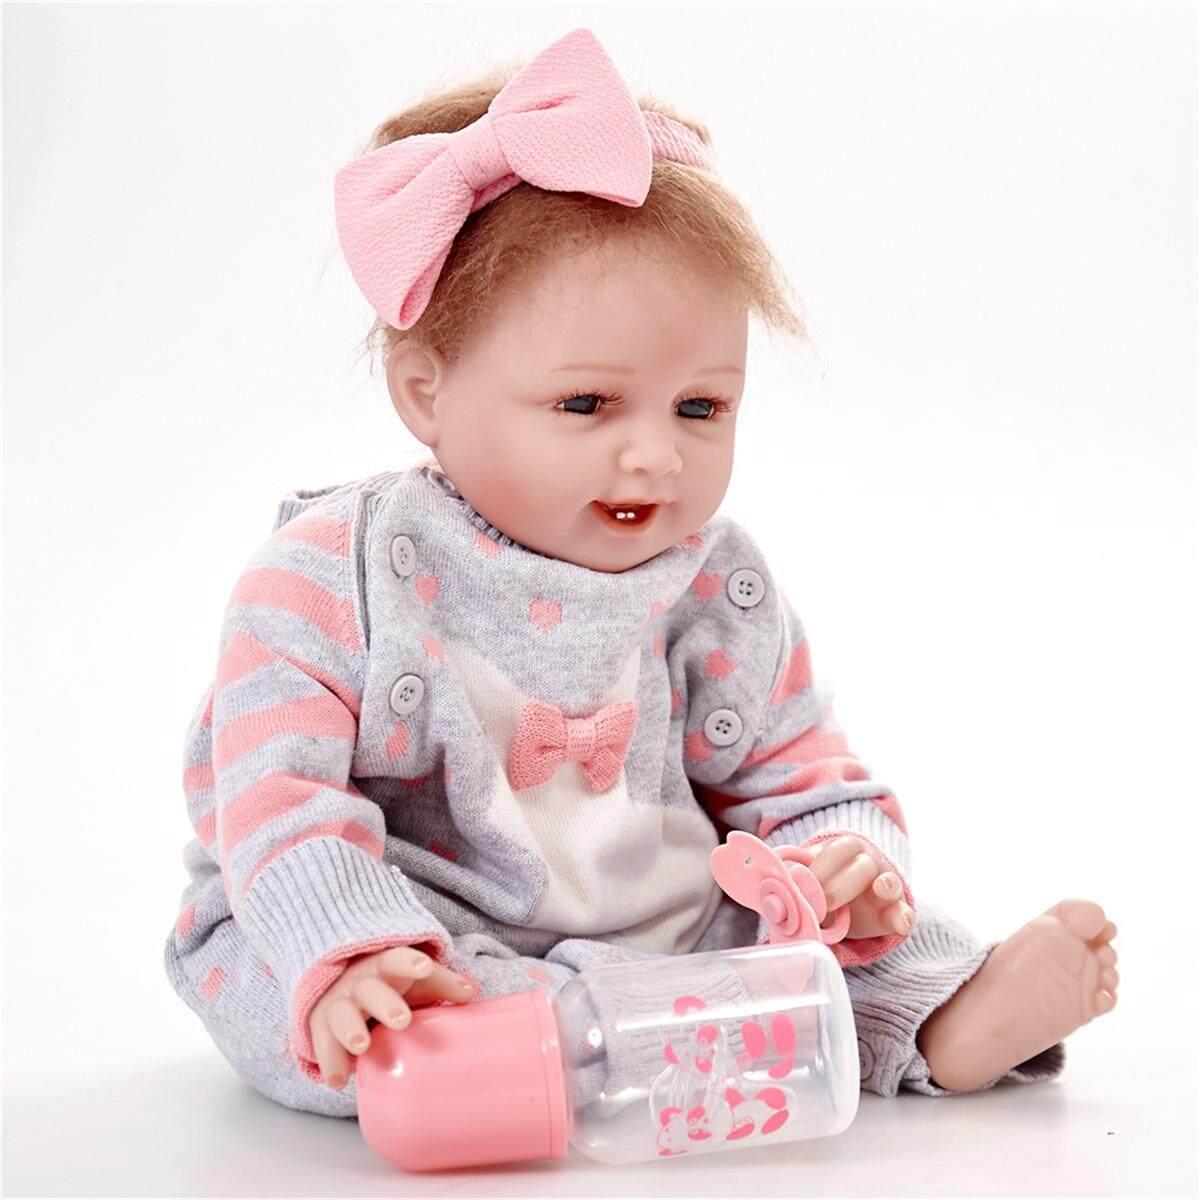 New Newborn Reborn Baby Girl 22 Lifelike Doll Realistic Toy Christmas Gift